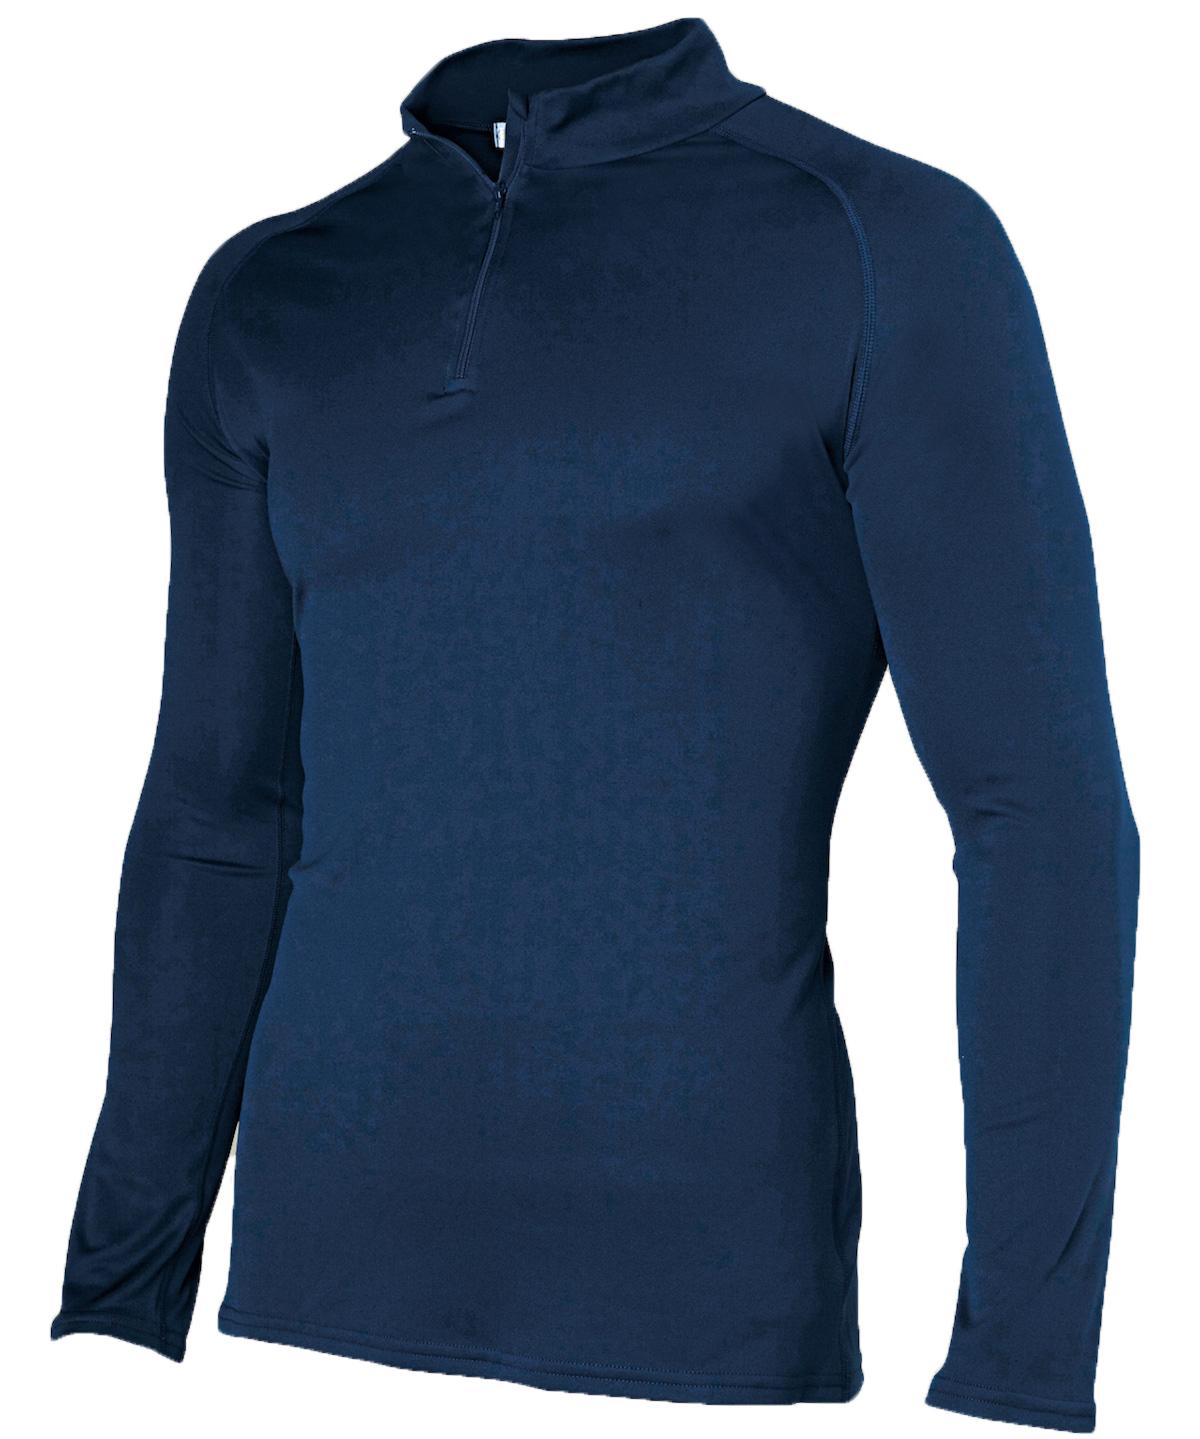 Damart Sport Easy Body 4 col zippé - T-Shirt - Herren